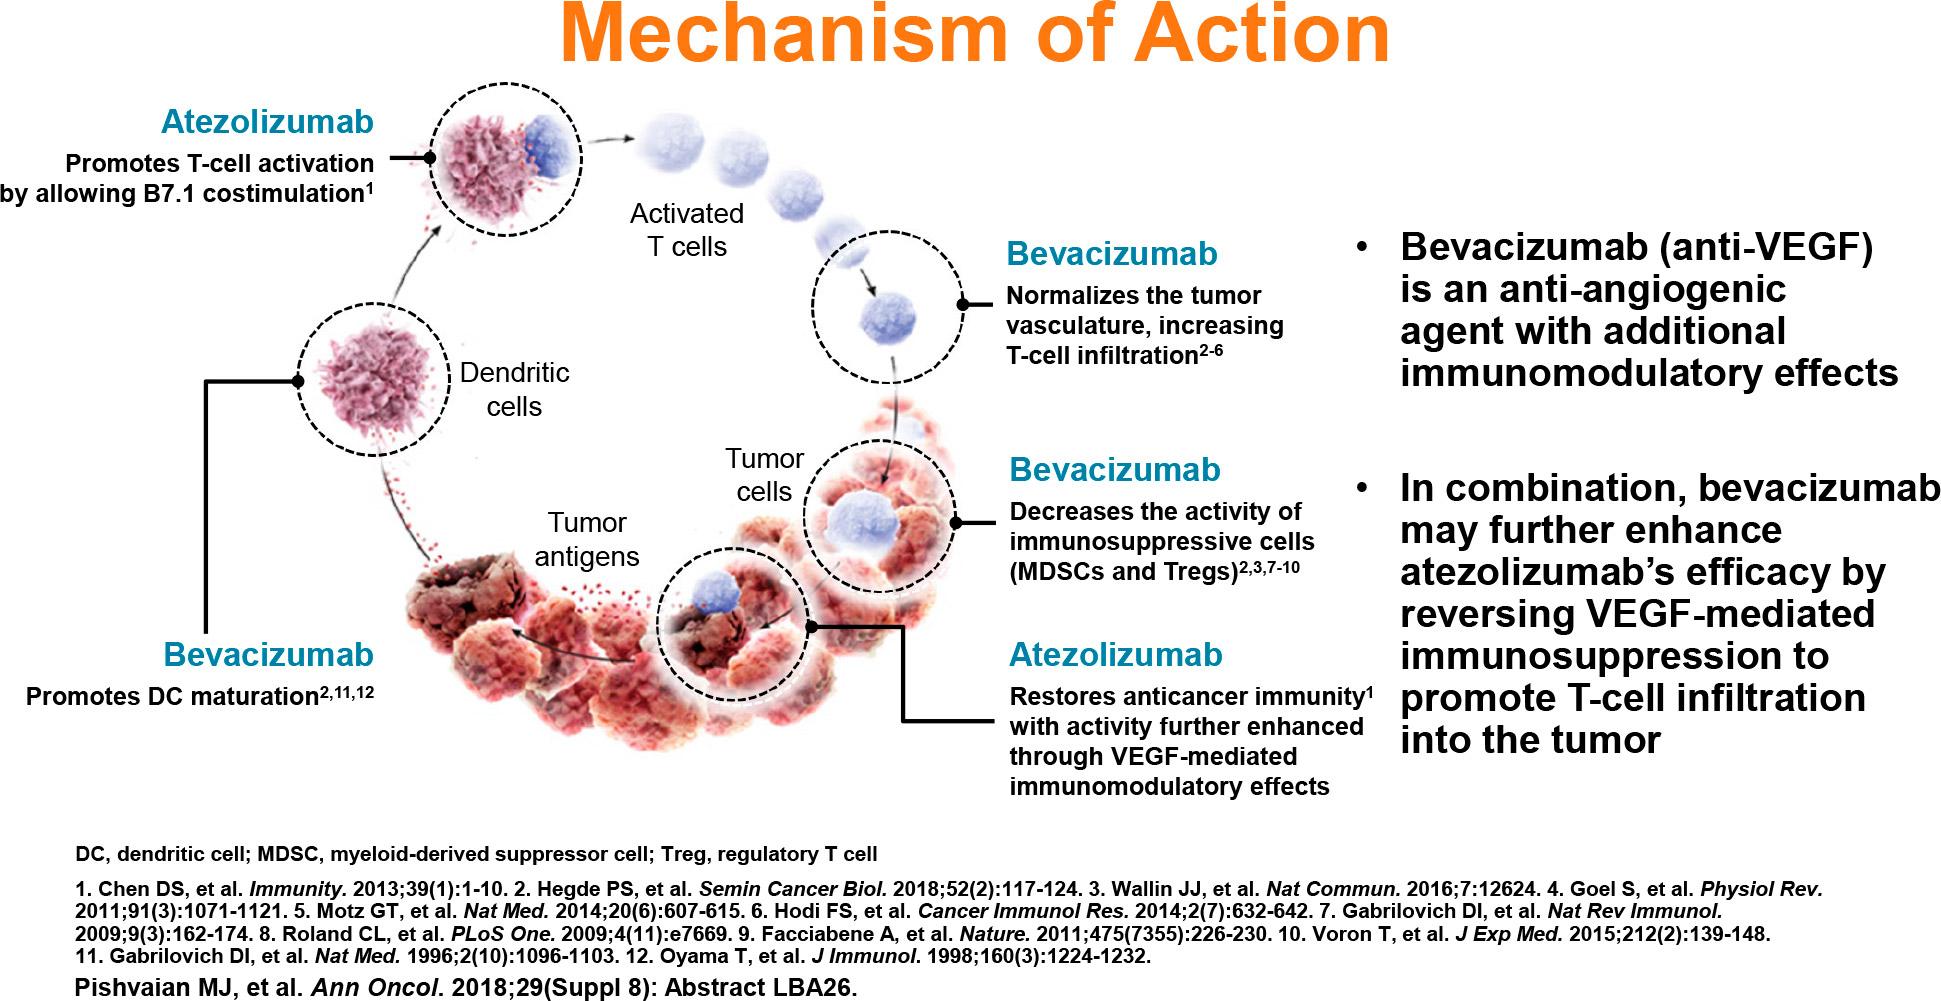 bevacizumab plus atezolizumab moa - «Тецентрик» плюс «Авастин»: иммуноонкологическое лечение гепатоцеллюлярной карциномы